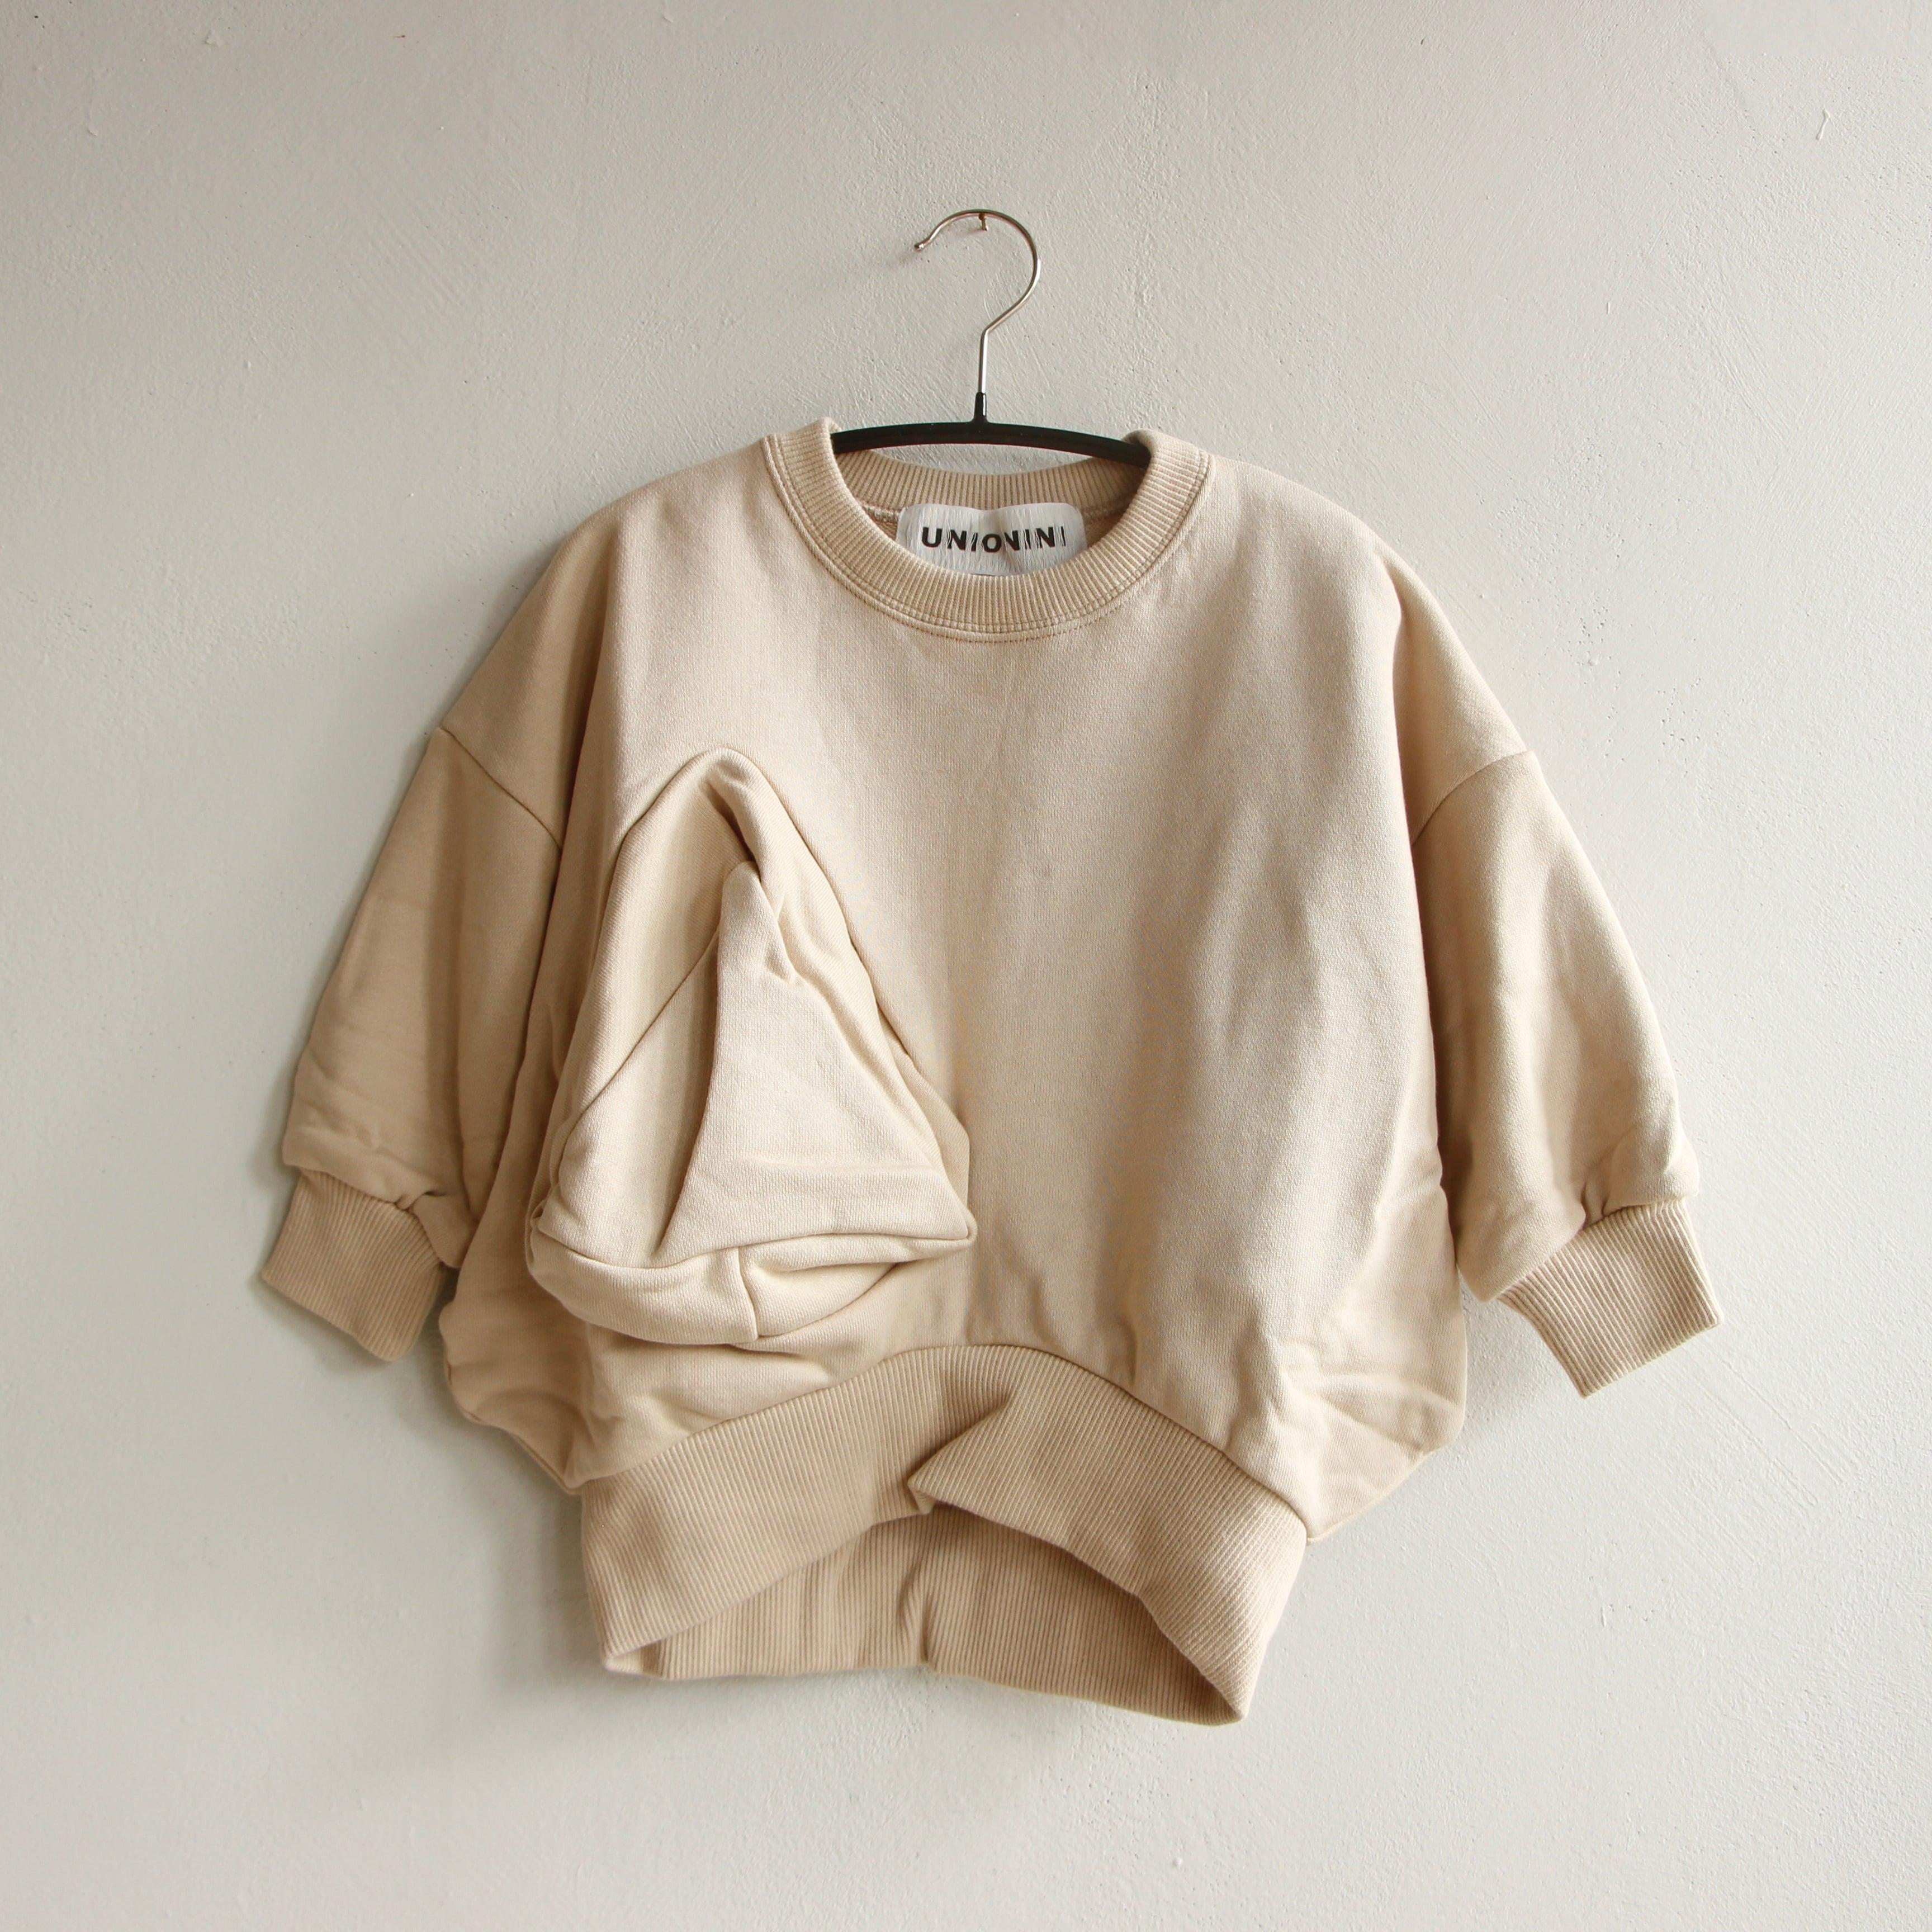 《UNIONINI 2021AW》◯△ sweat shirt / kinari / 1-12Y